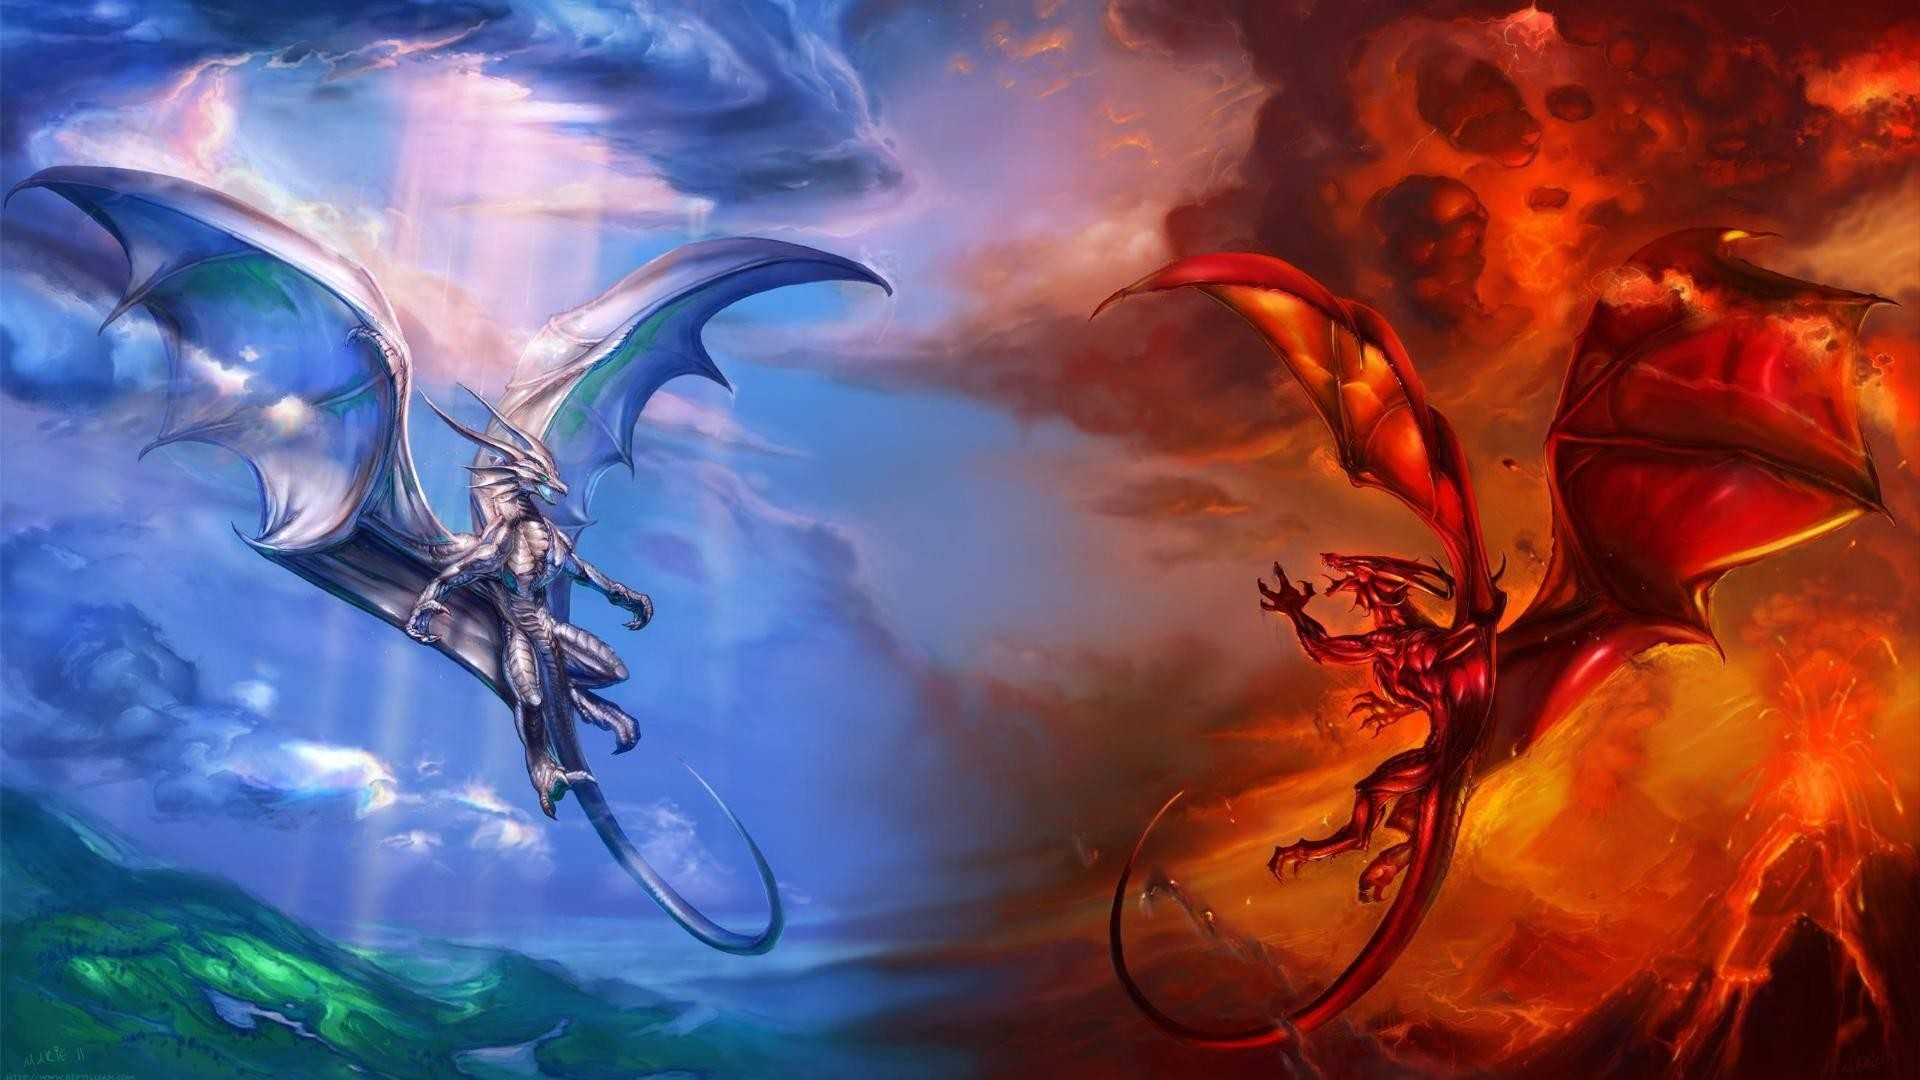 Fire Dragon Wallpapers Wallpaper 1920×1200 Dragon Backgrounds For Desktop  (46 Wallpapers) |